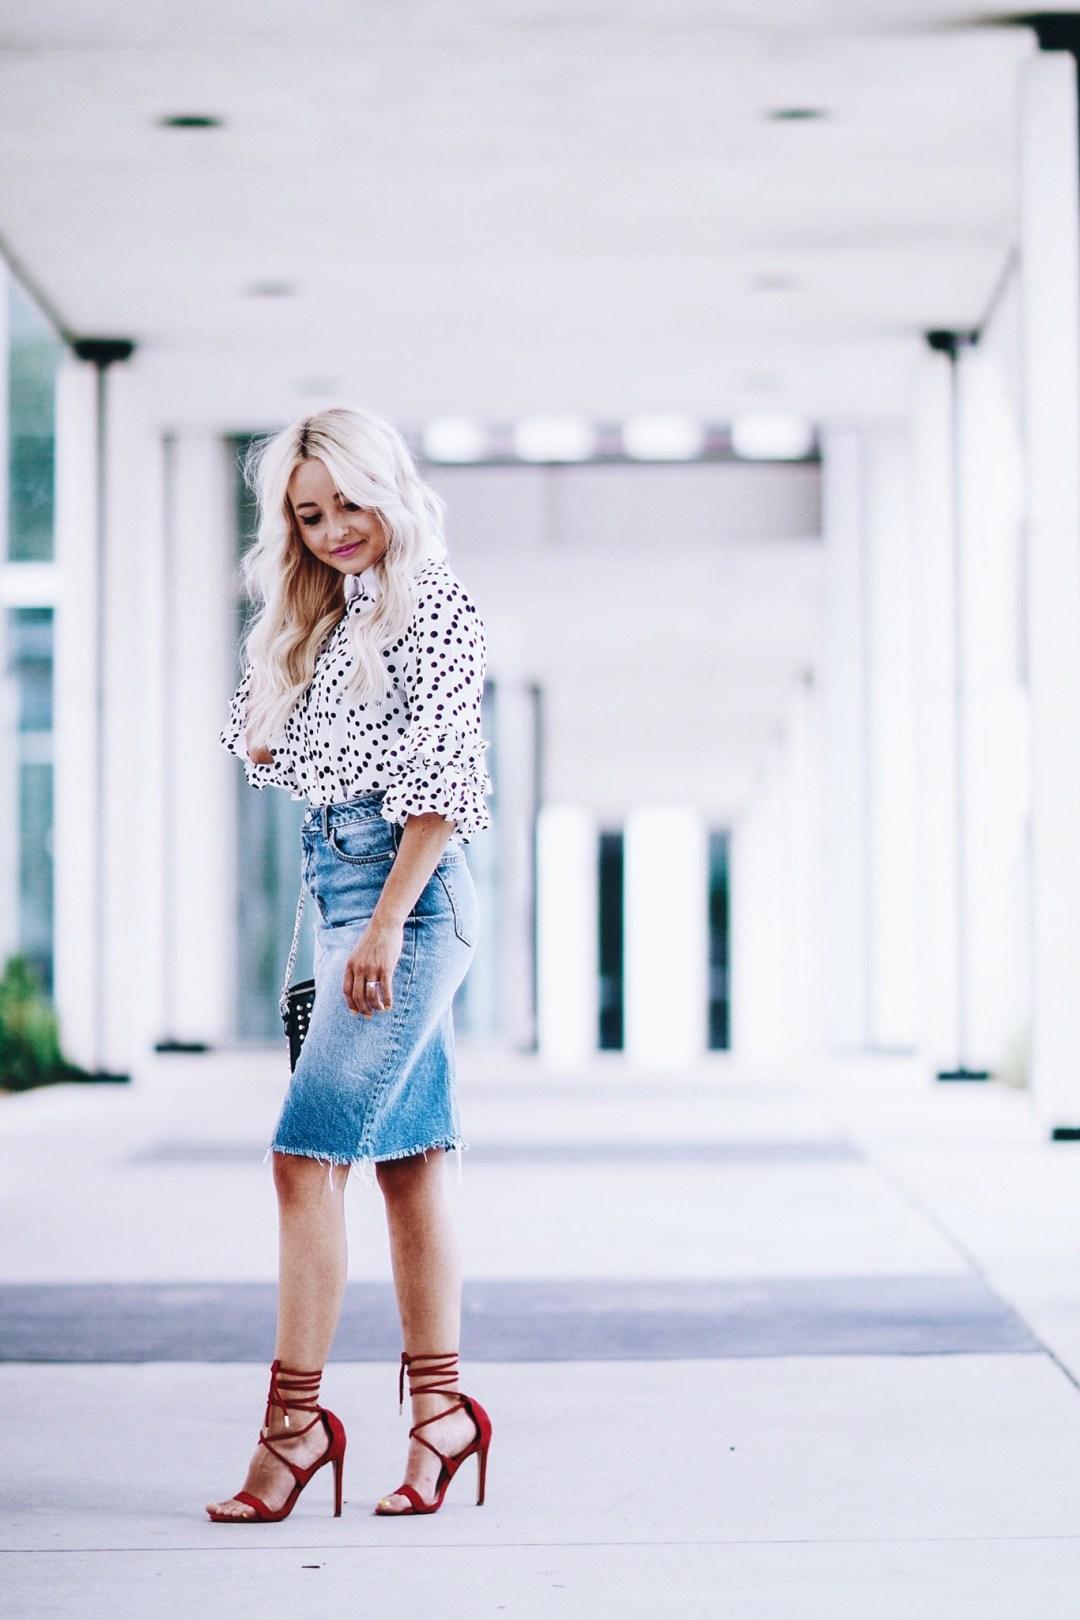 Alena Gidenko of modaprints.com styles a denim pencil skirt with a polka dot blouse